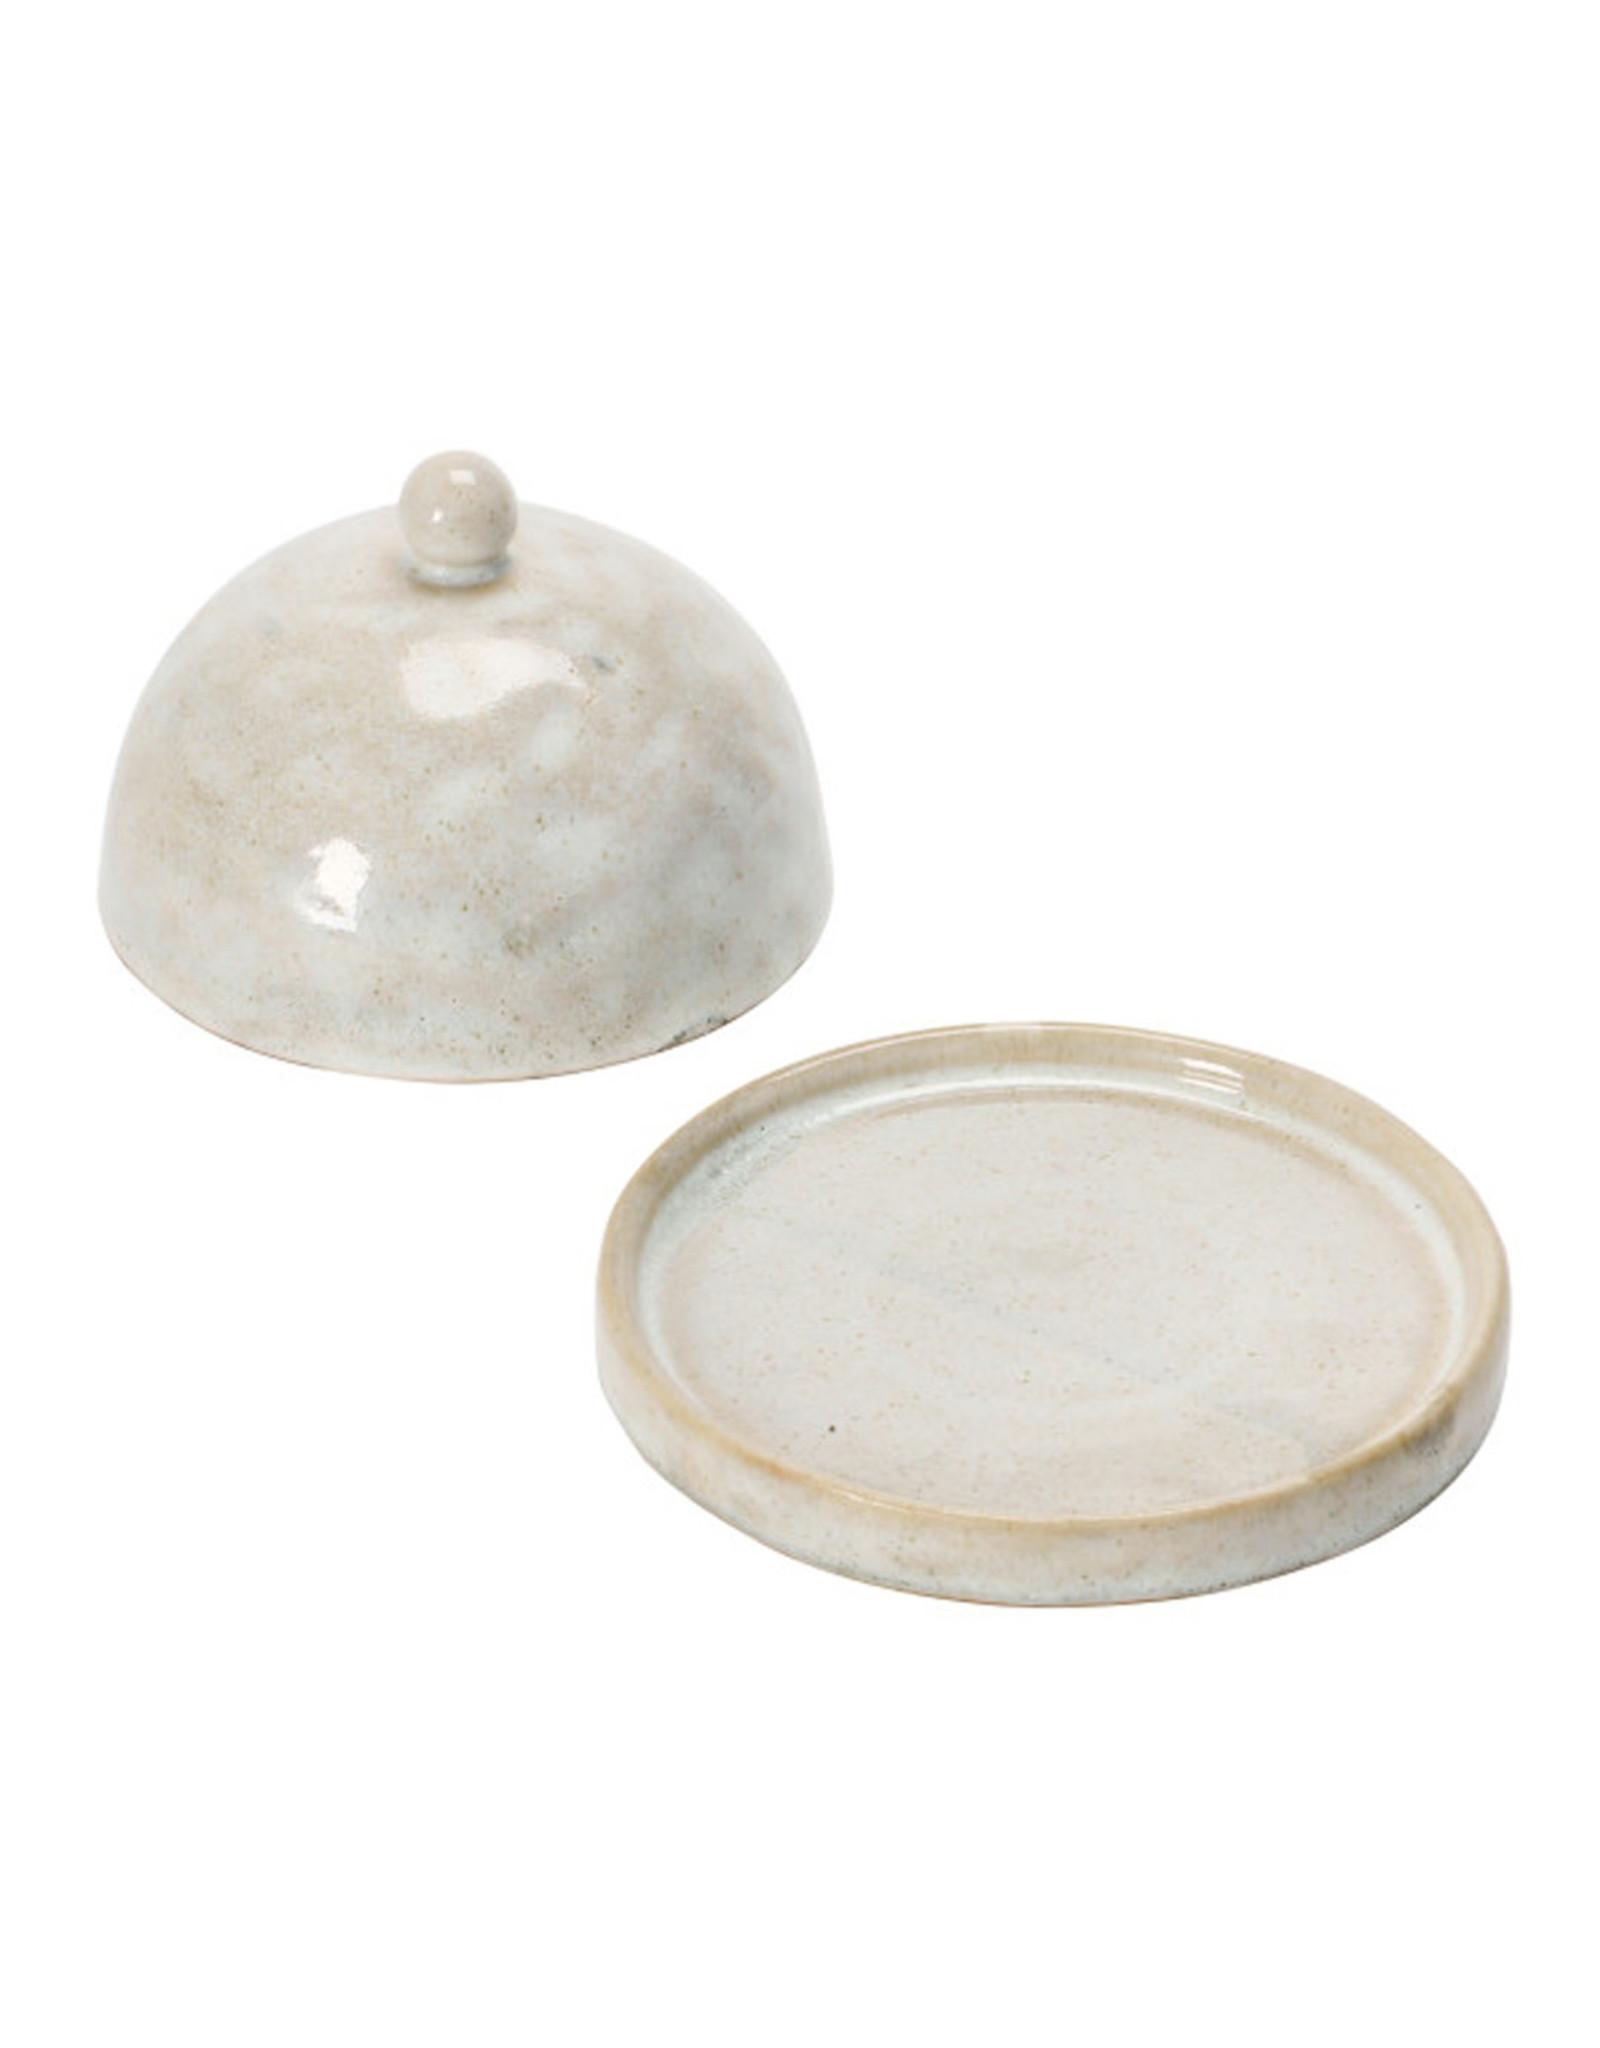 Domed Stoneware Dish